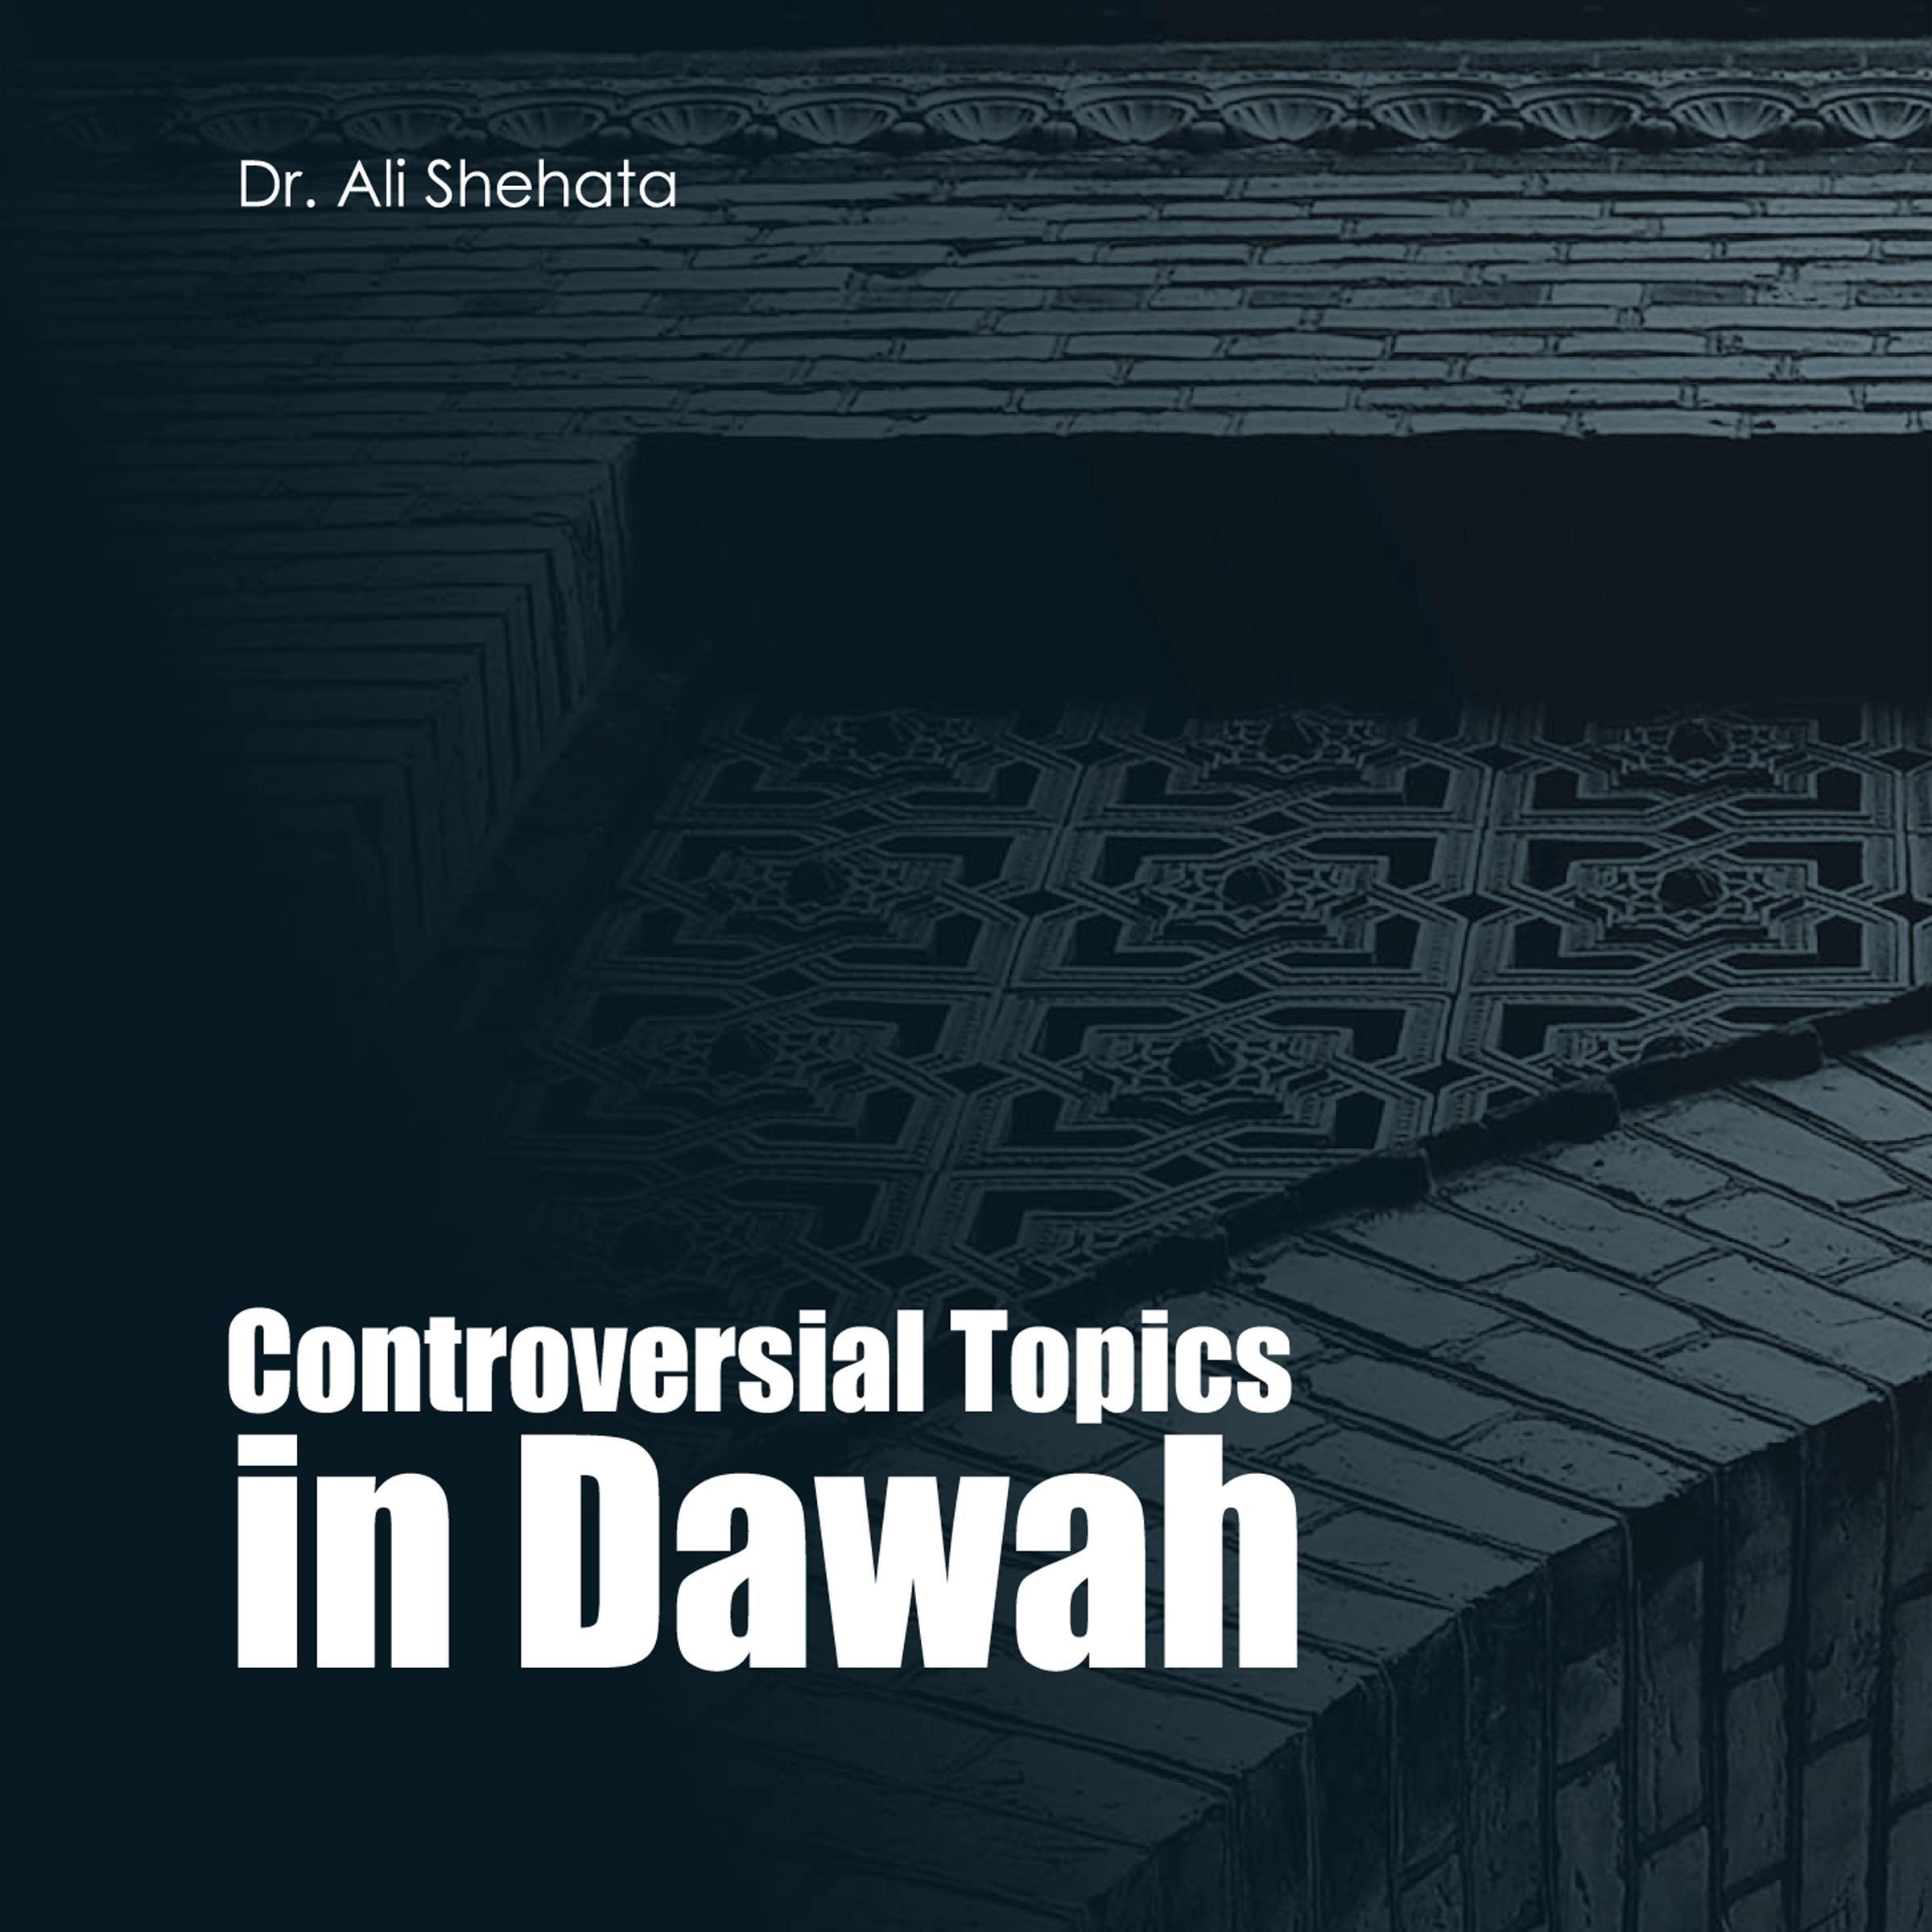 Controversial Topics In Da'wah, Vol. 1, Pt. 6 (Live)